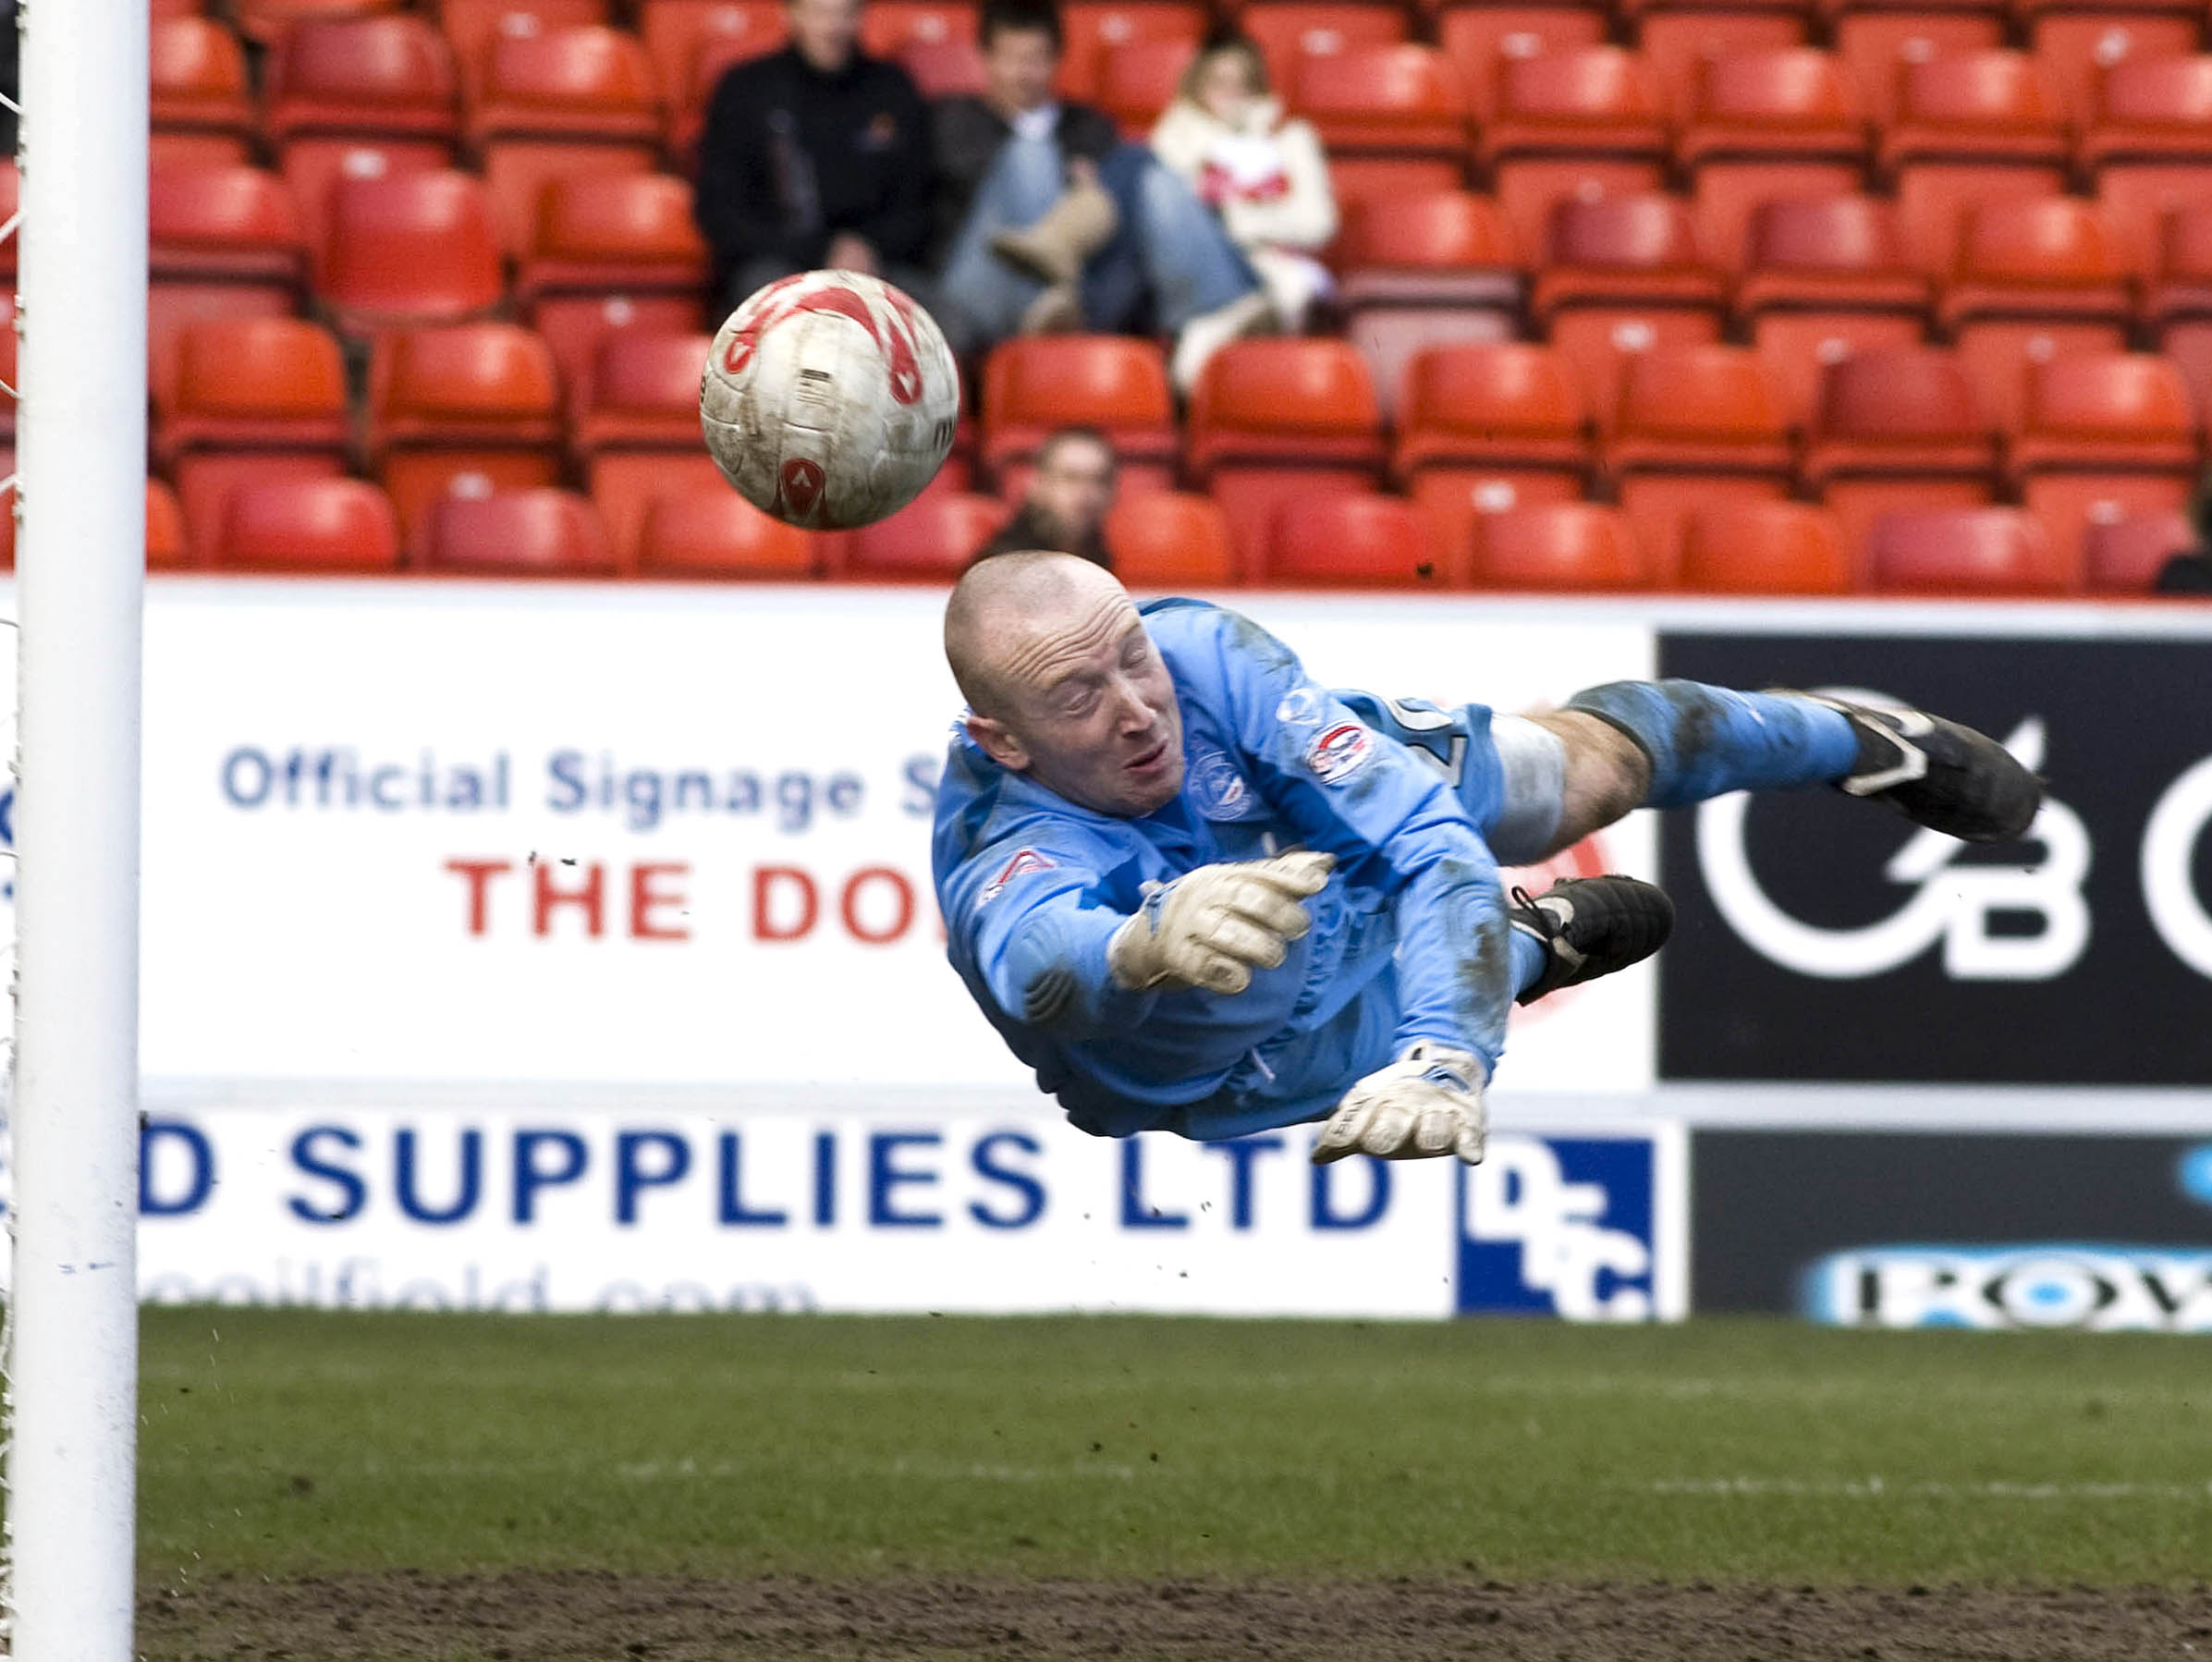 Derek Soutar making a save for Aberdeen in 2008.